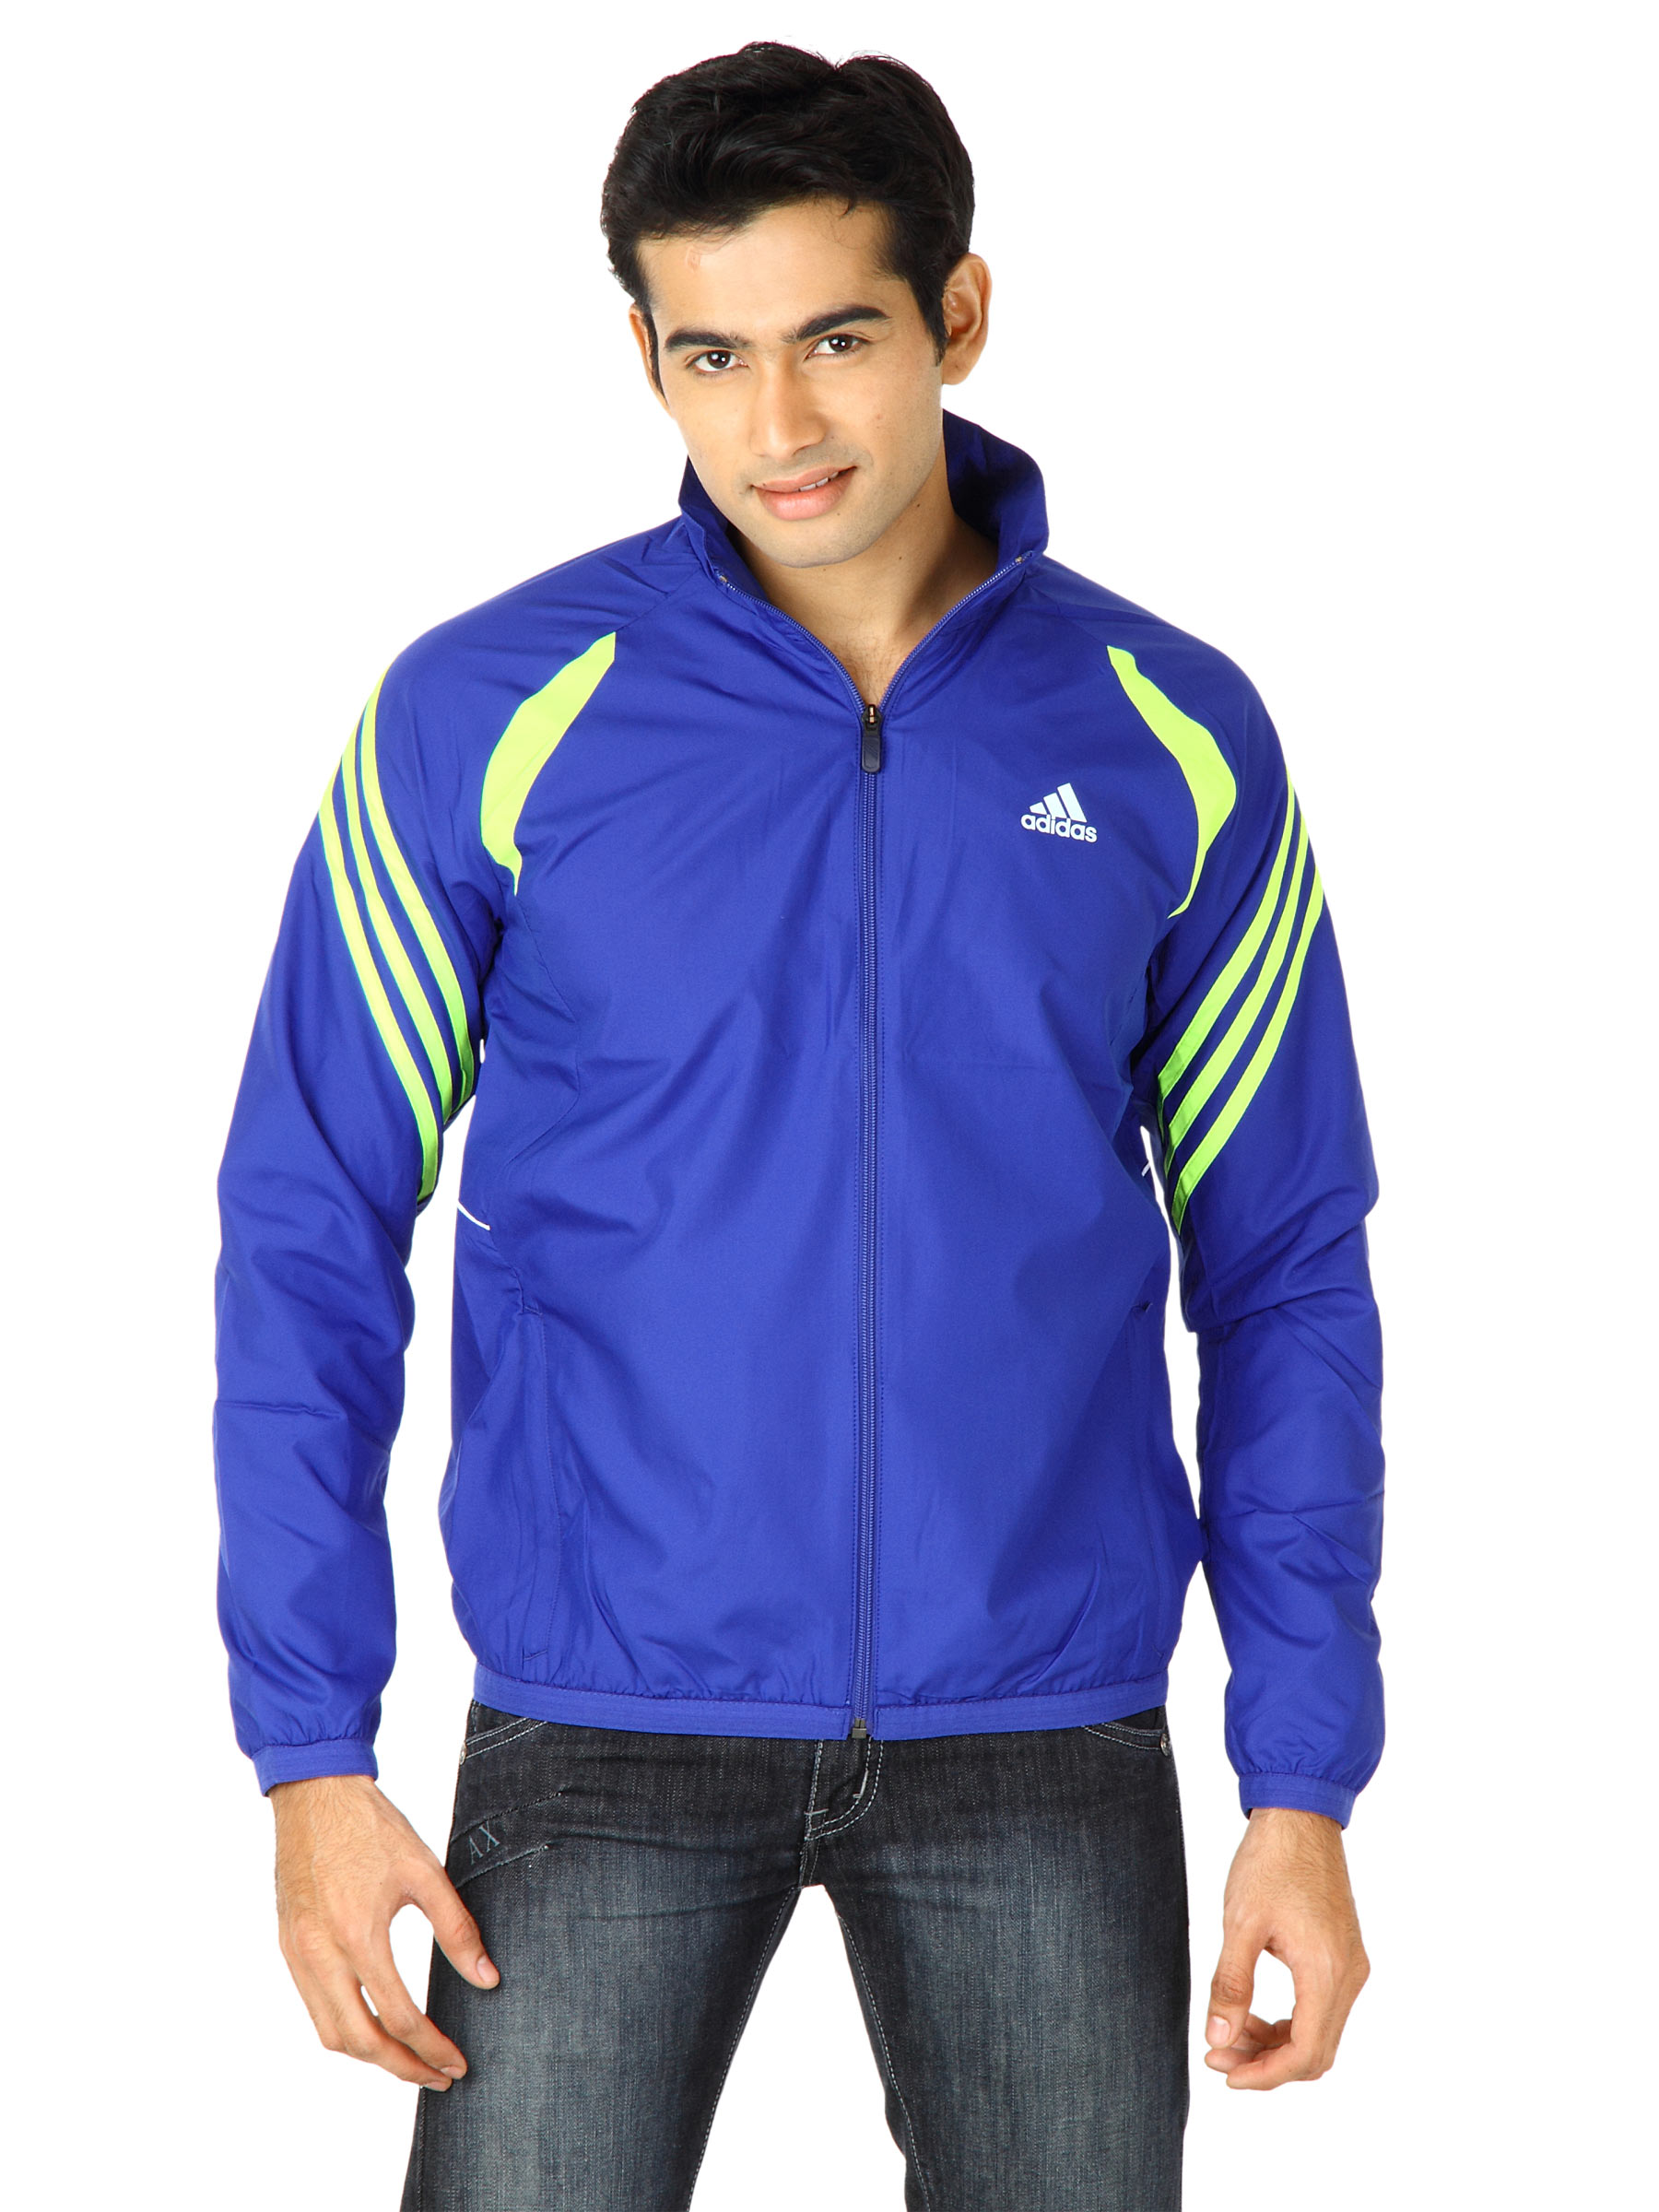 Adidas Men Adna Blue Jackets